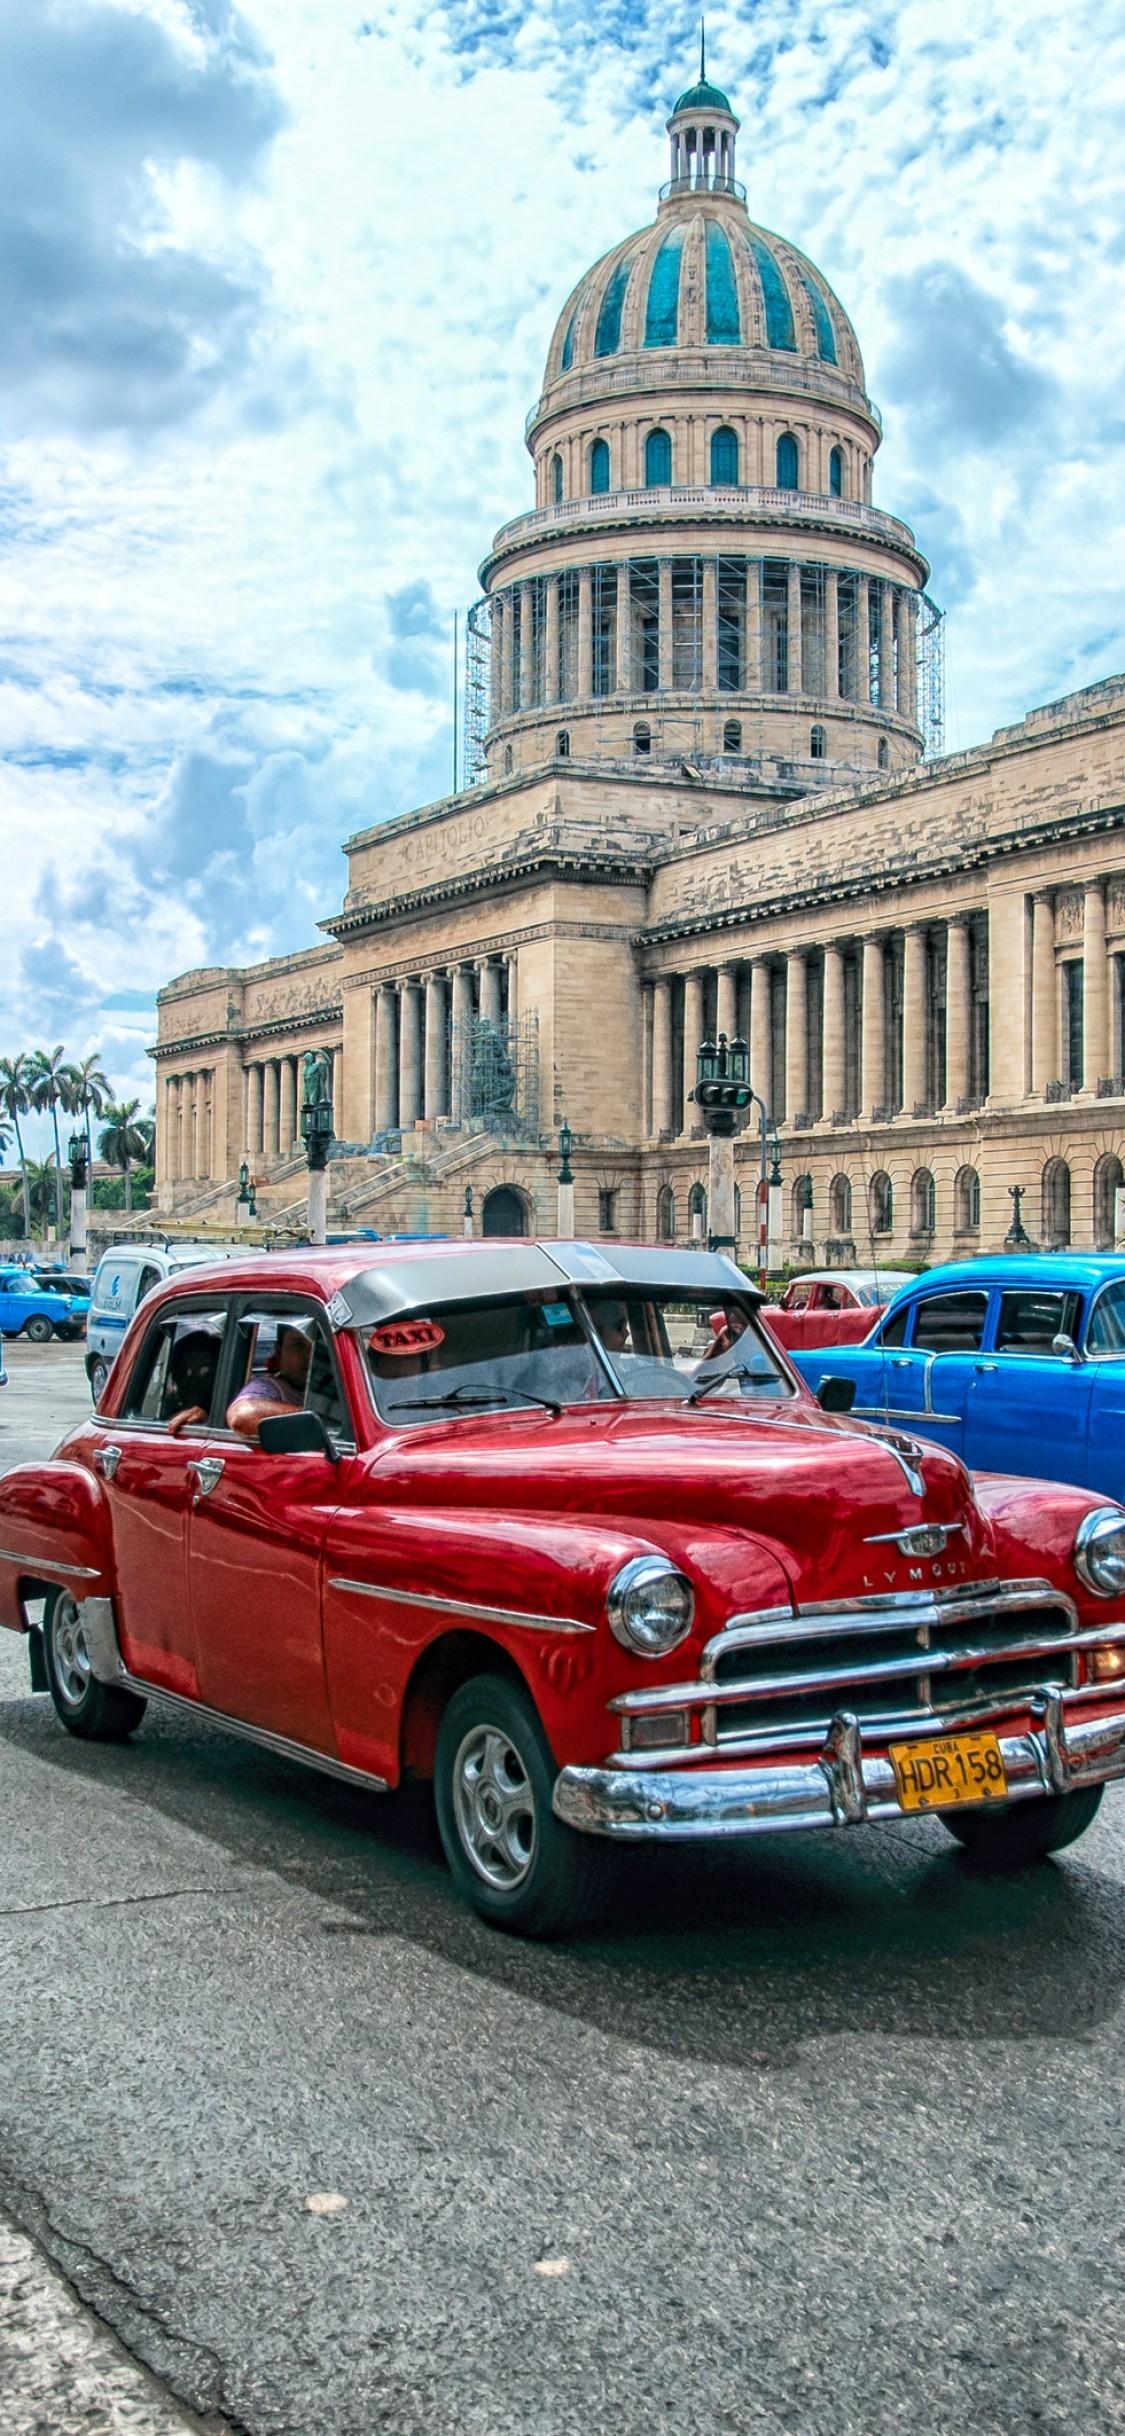 Cuban Flag Wallpaper - National Capital Building , HD Wallpaper & Backgrounds